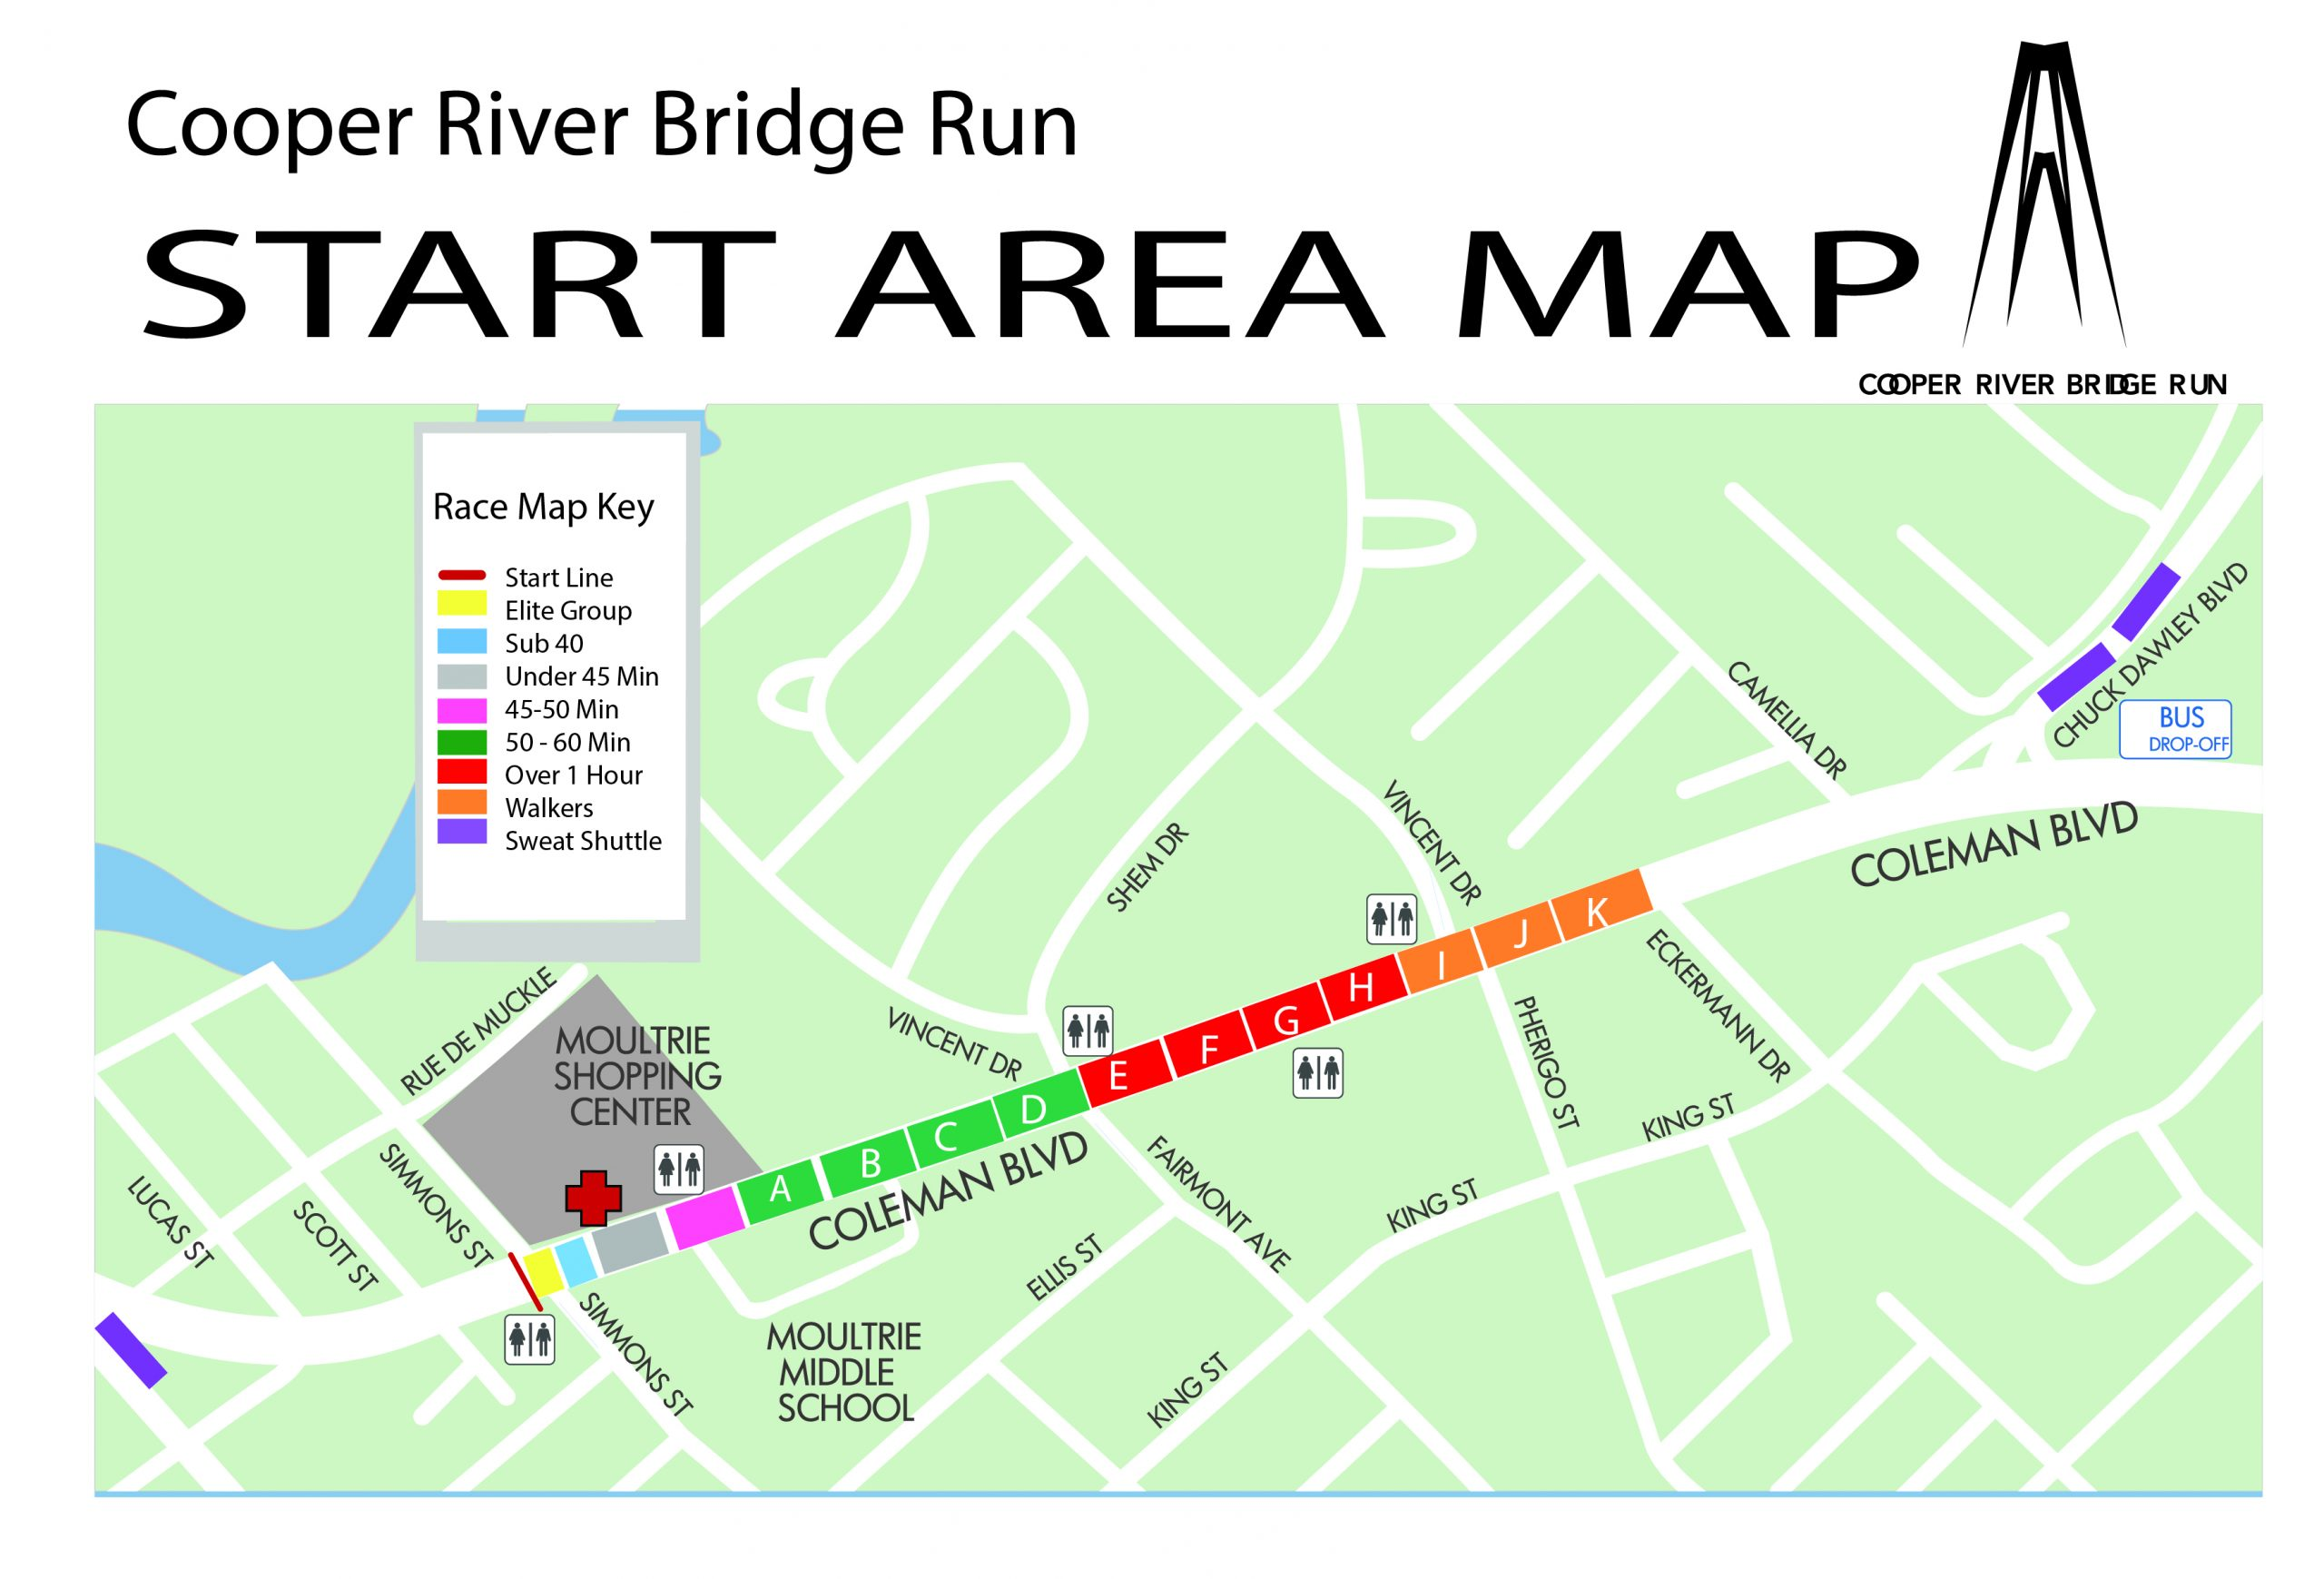 Cooper River Bridge Run Startline - How to map a run